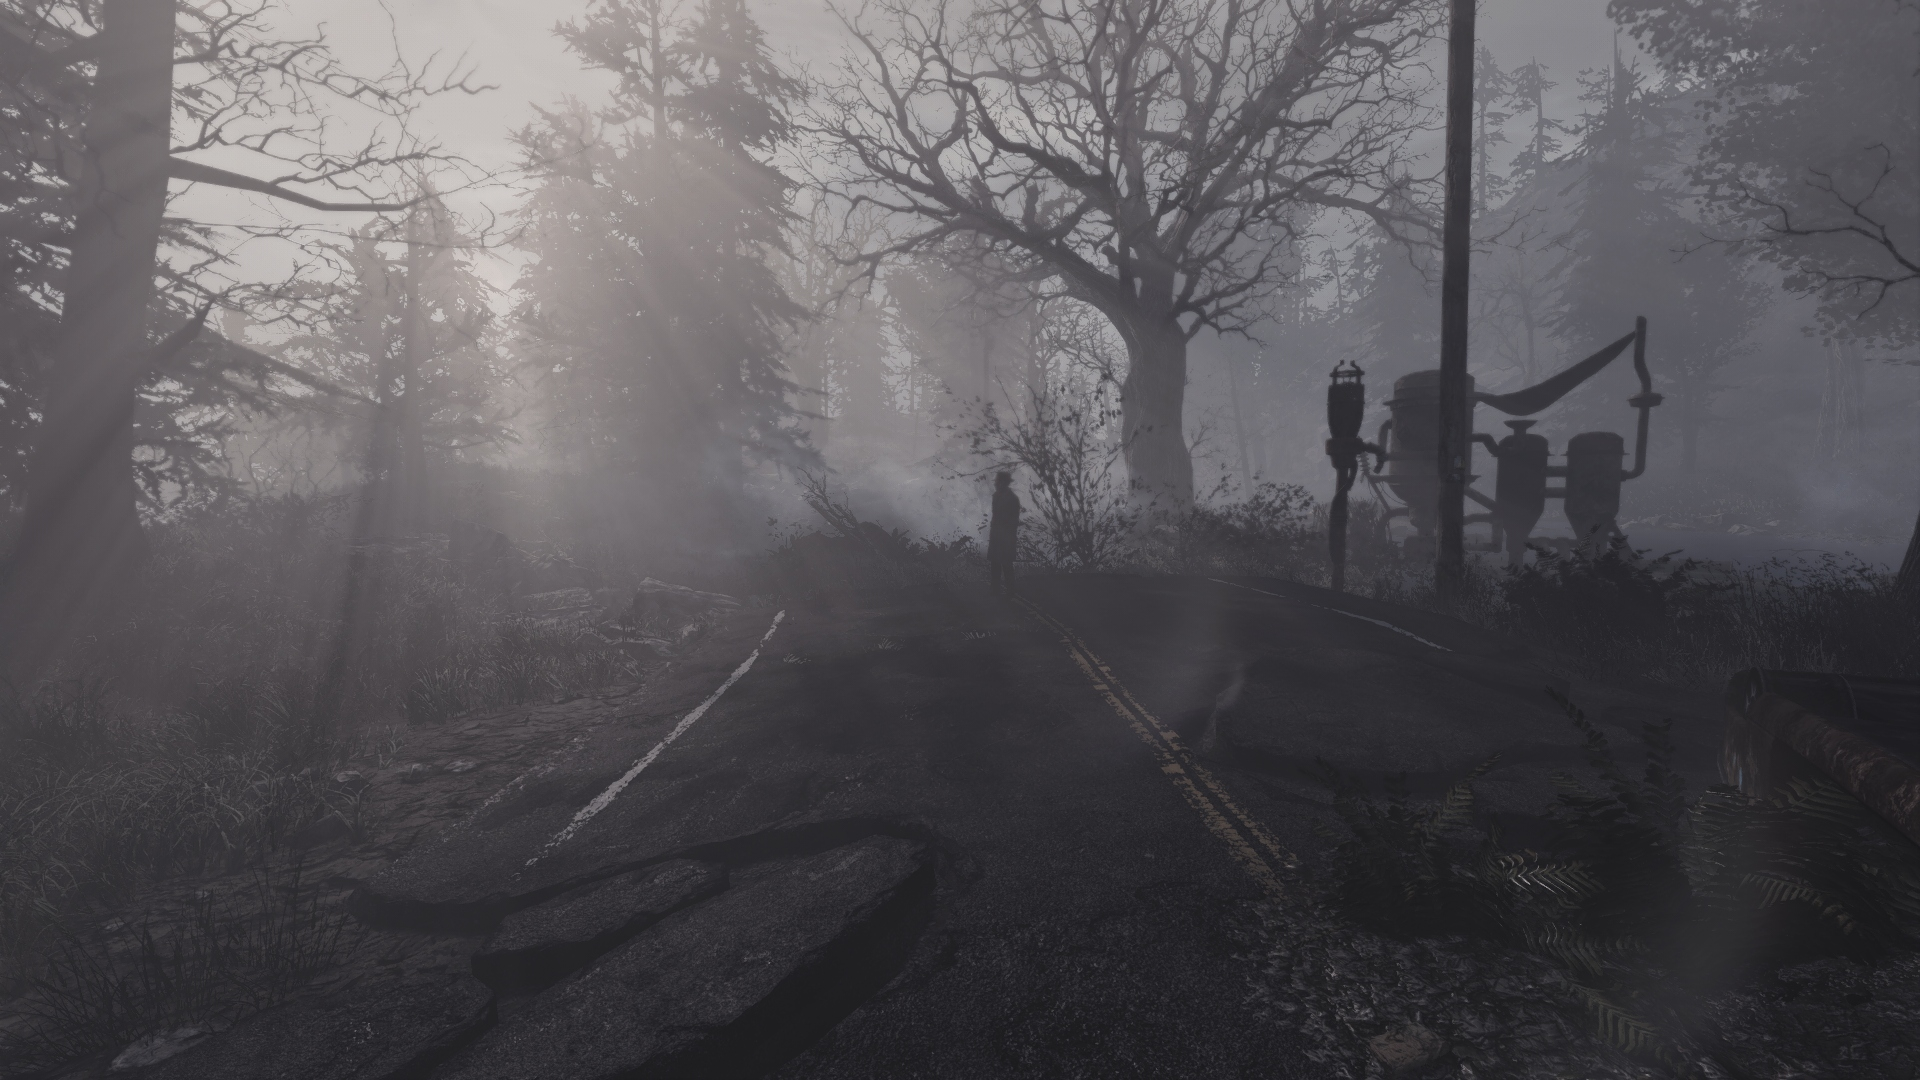 Fallout4 2020-09-13 19-44-27.jpg